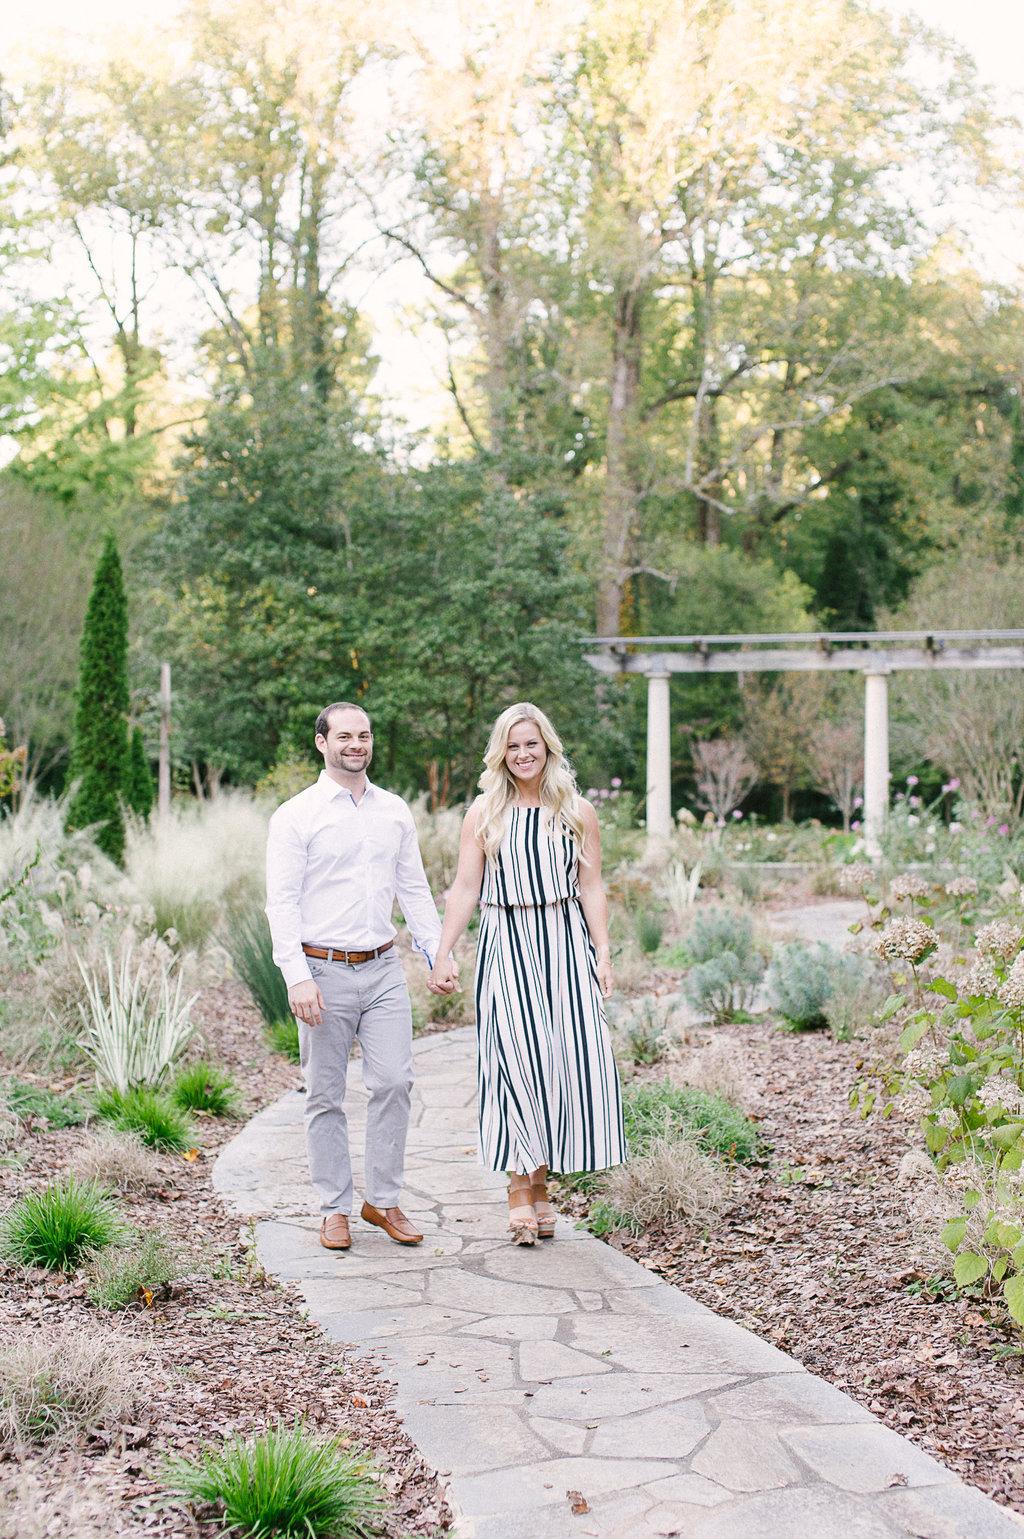 Cator-Woolford-Gardens-Engagement-atlanta-wedding-photographer-hannah-forsberg-9.jpg